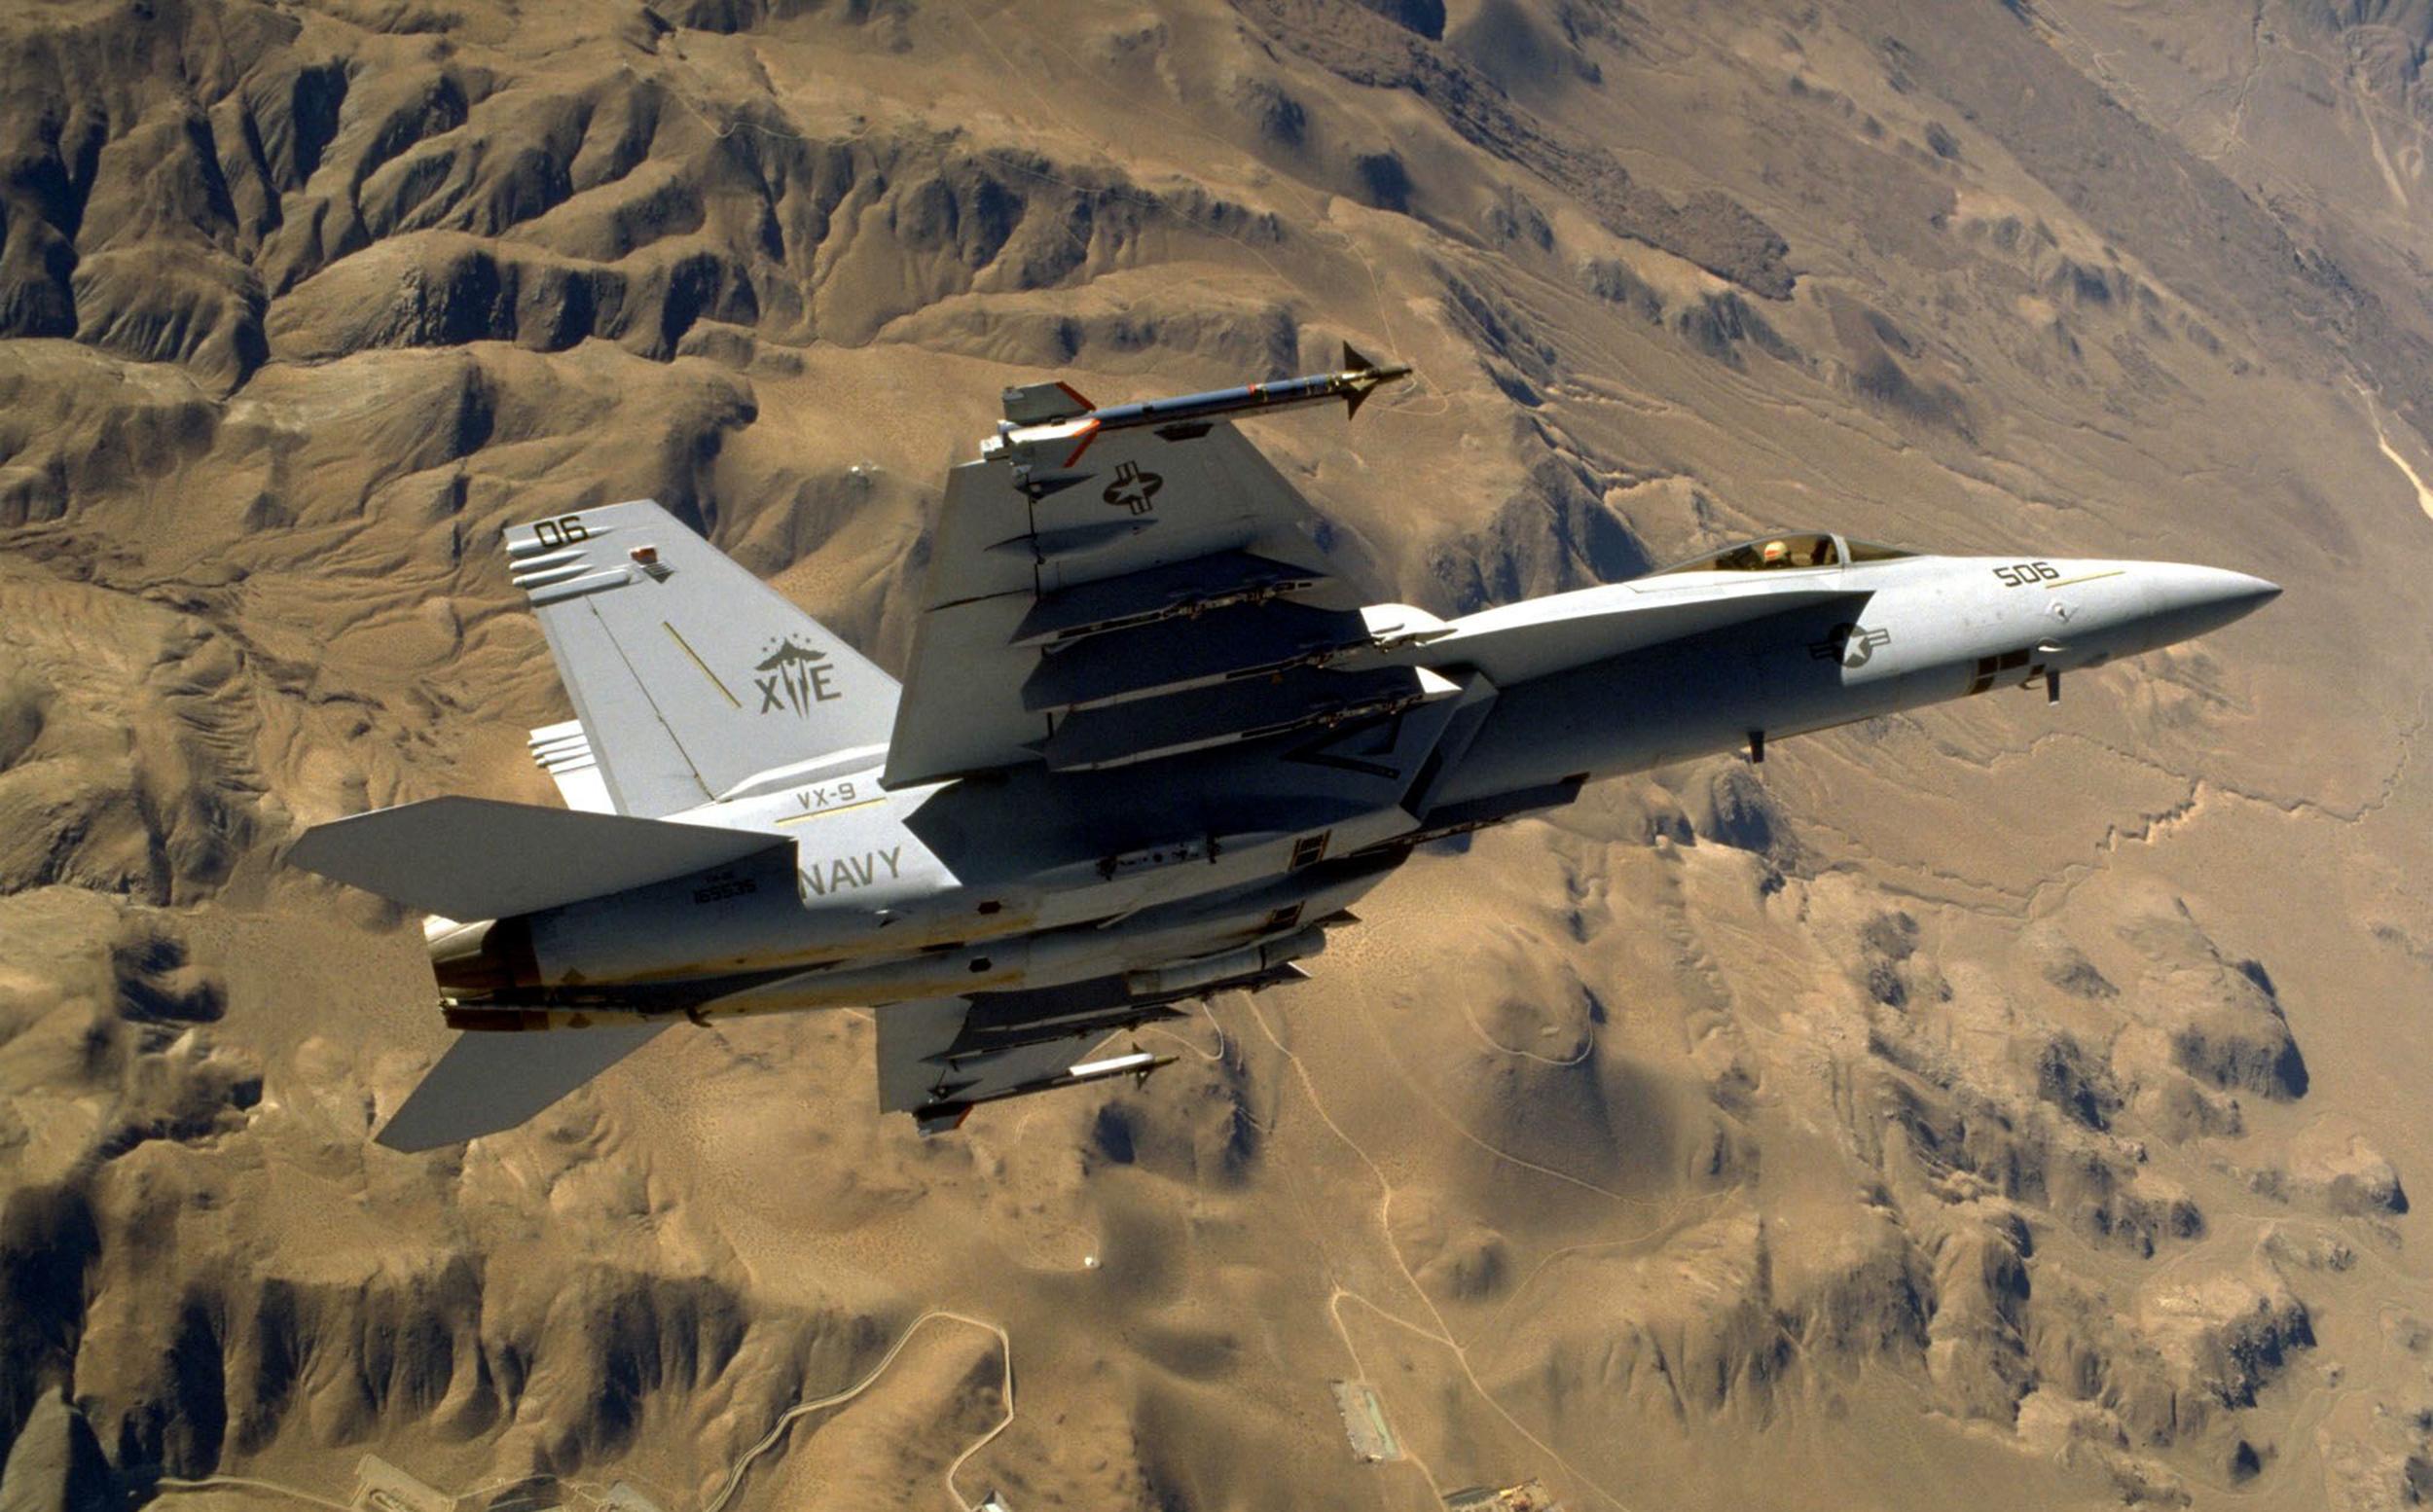 Pilot missing after fighter jet crashes in Death Valley